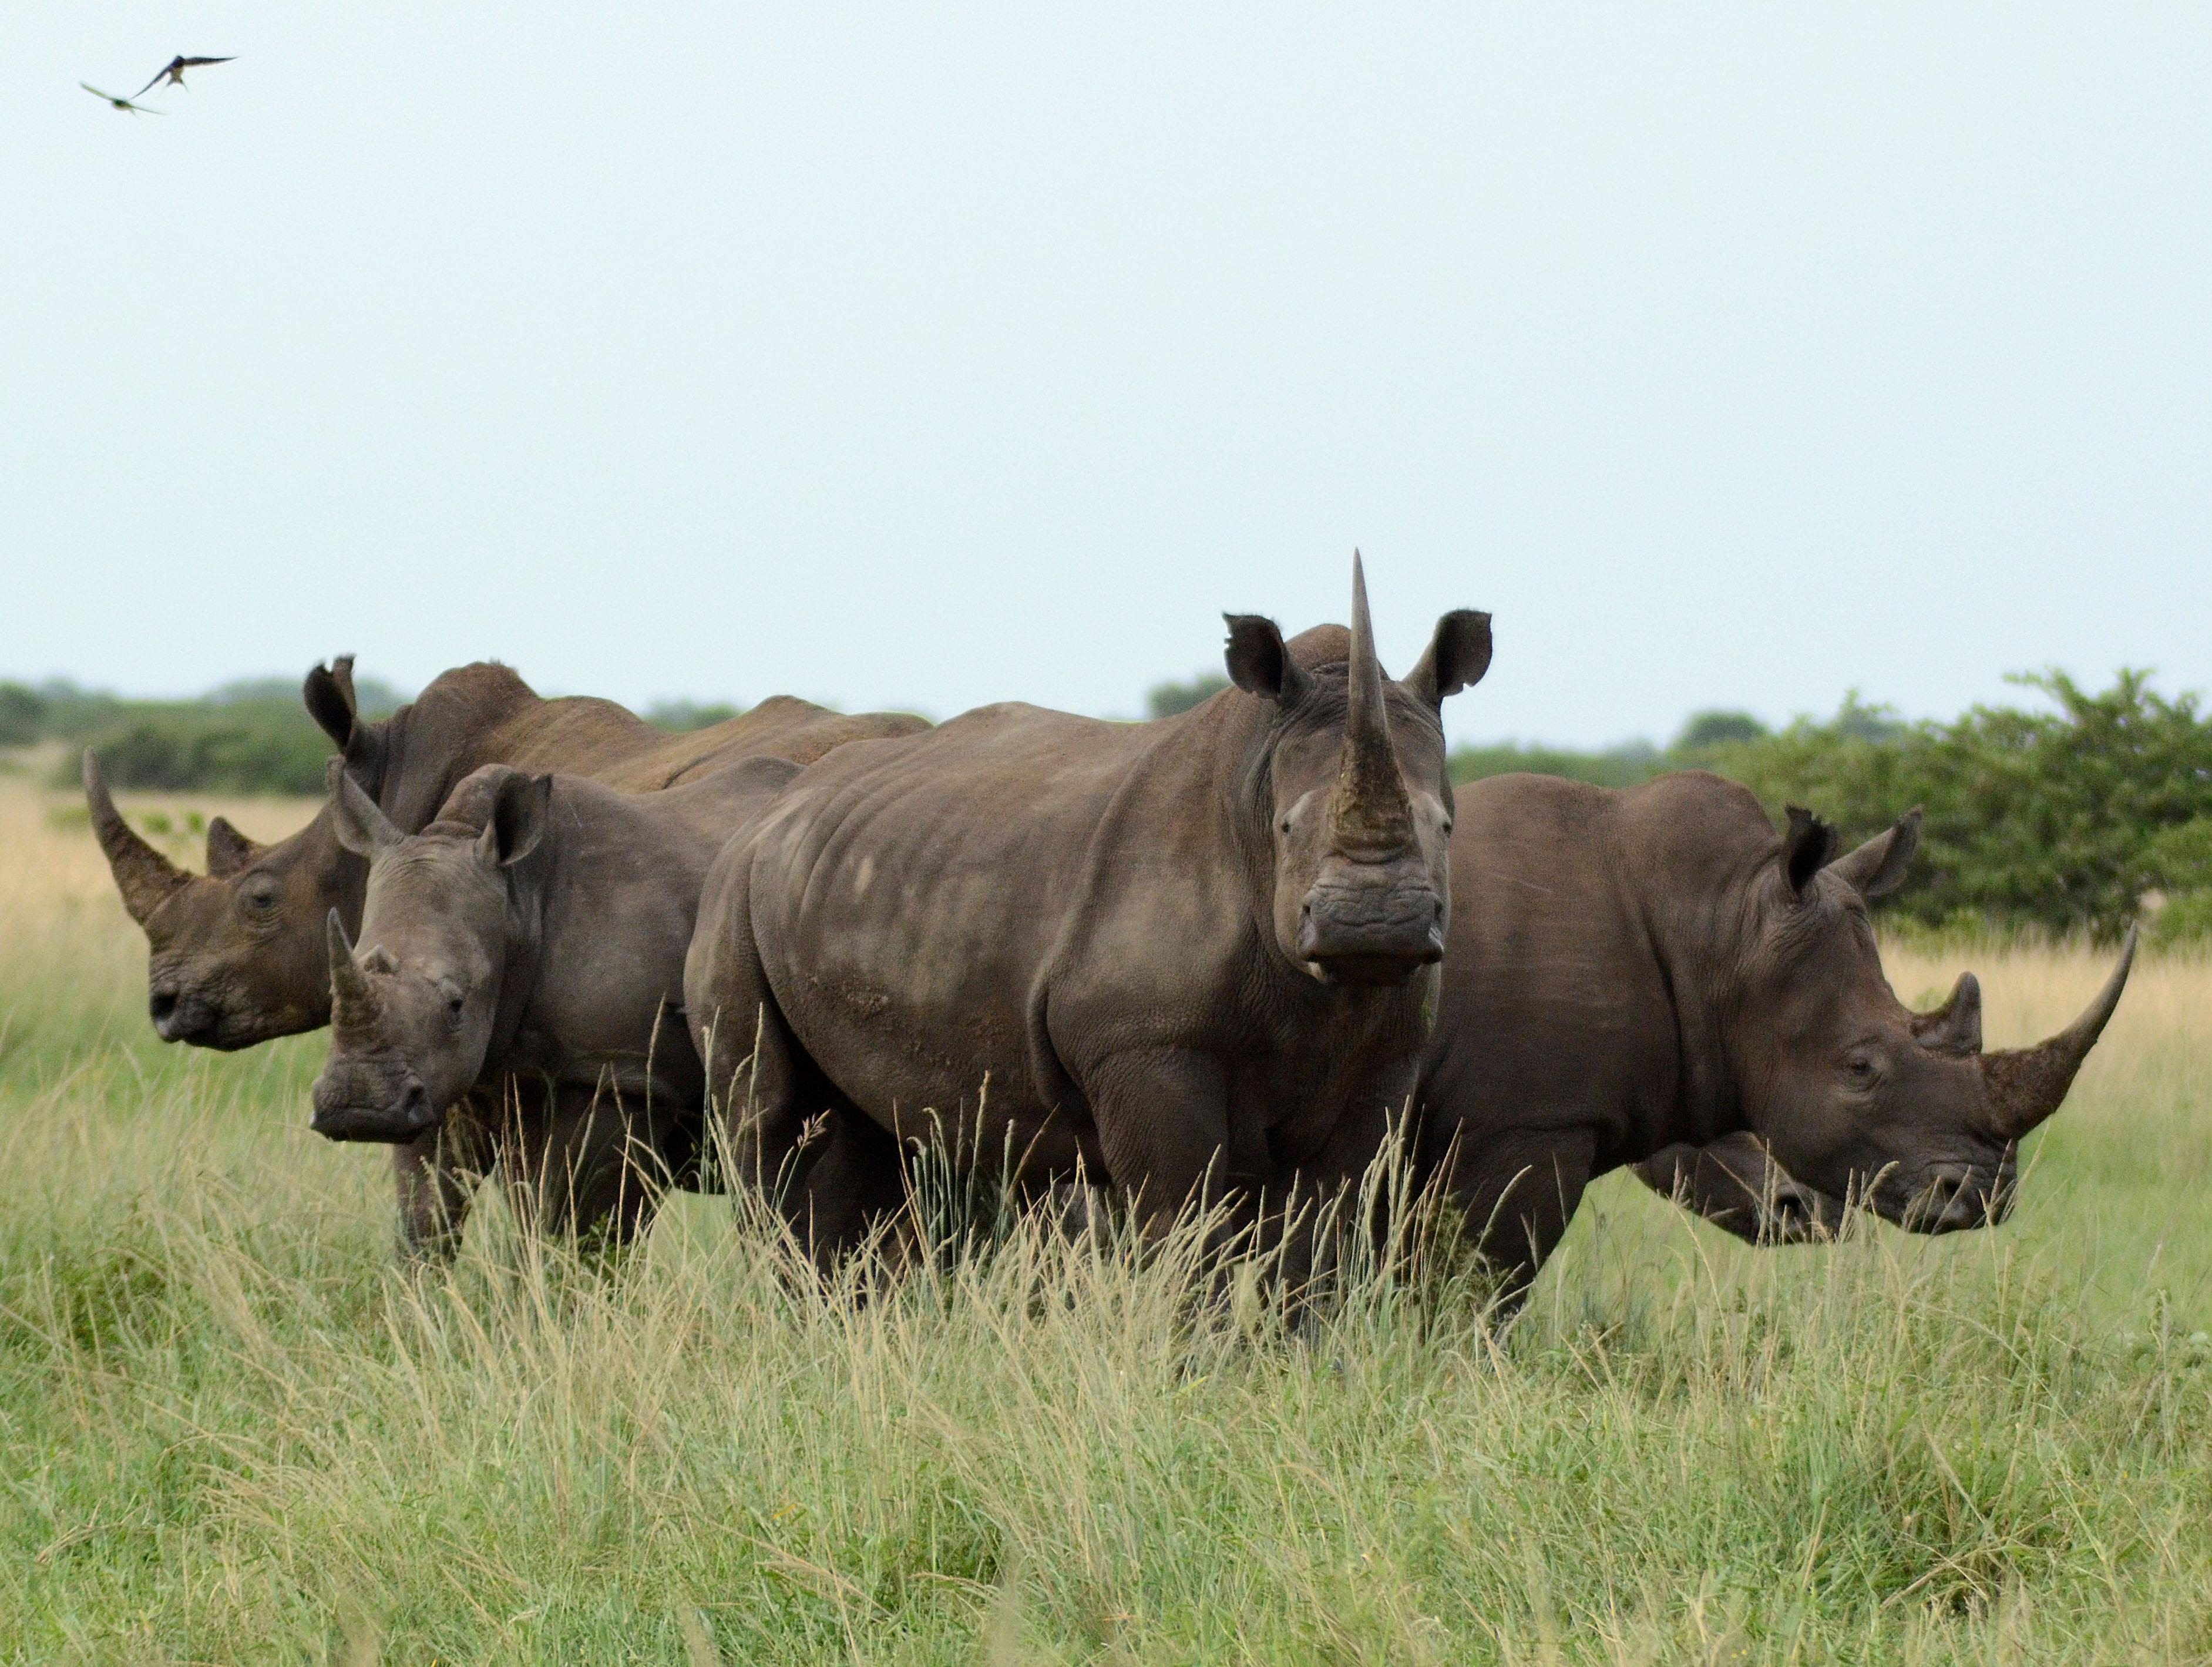 White rhino, rhino behavior, rhino vocalization, rhino social, rhino conservation